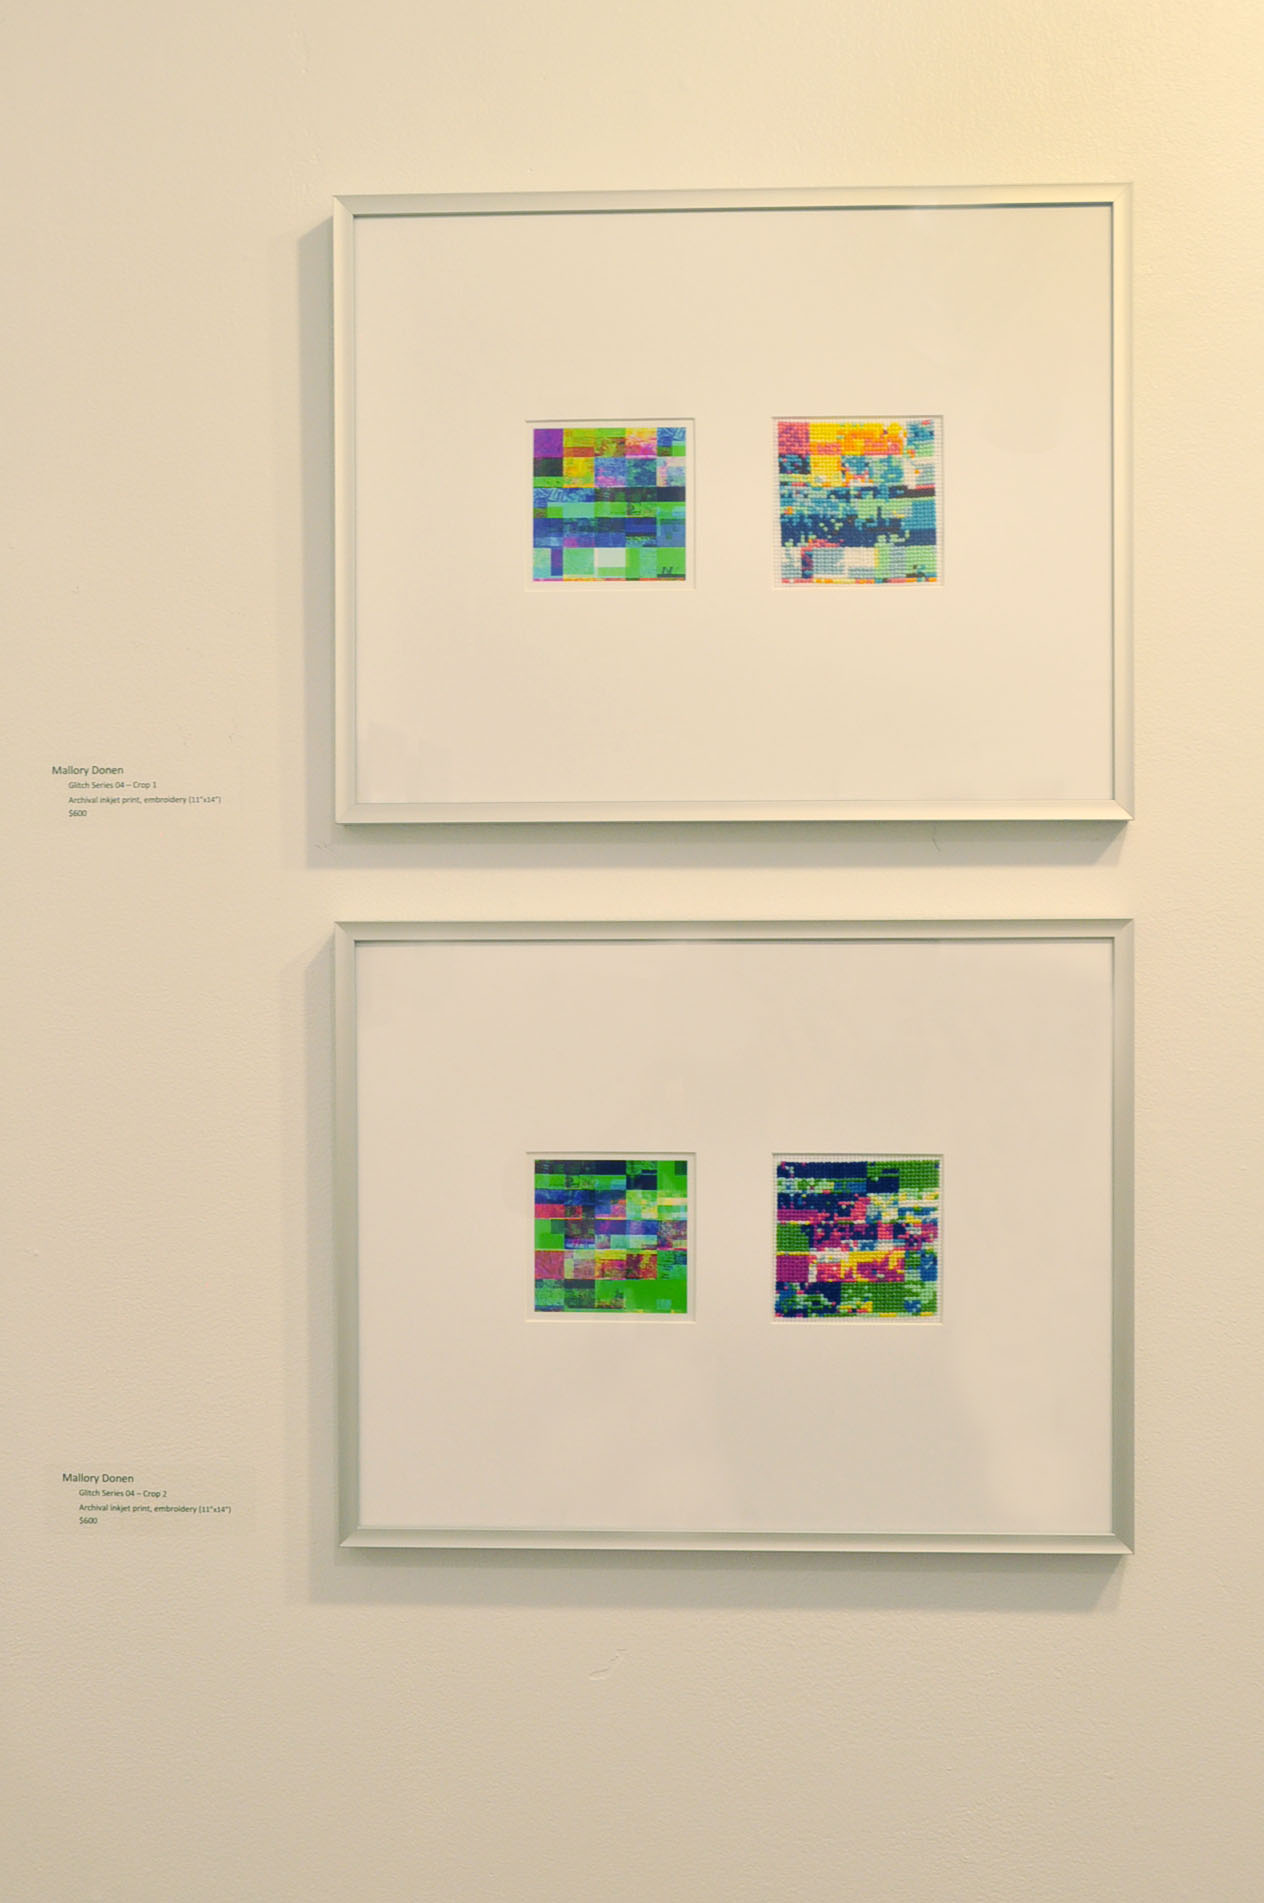 Glitch Series 04 - Crop_1.jpg  (top) &  Glitch Series 04- Crop_2.jpg  (bottom), inkjet prints, embroidery floss, Aida cloth, 11x14 inches (each)